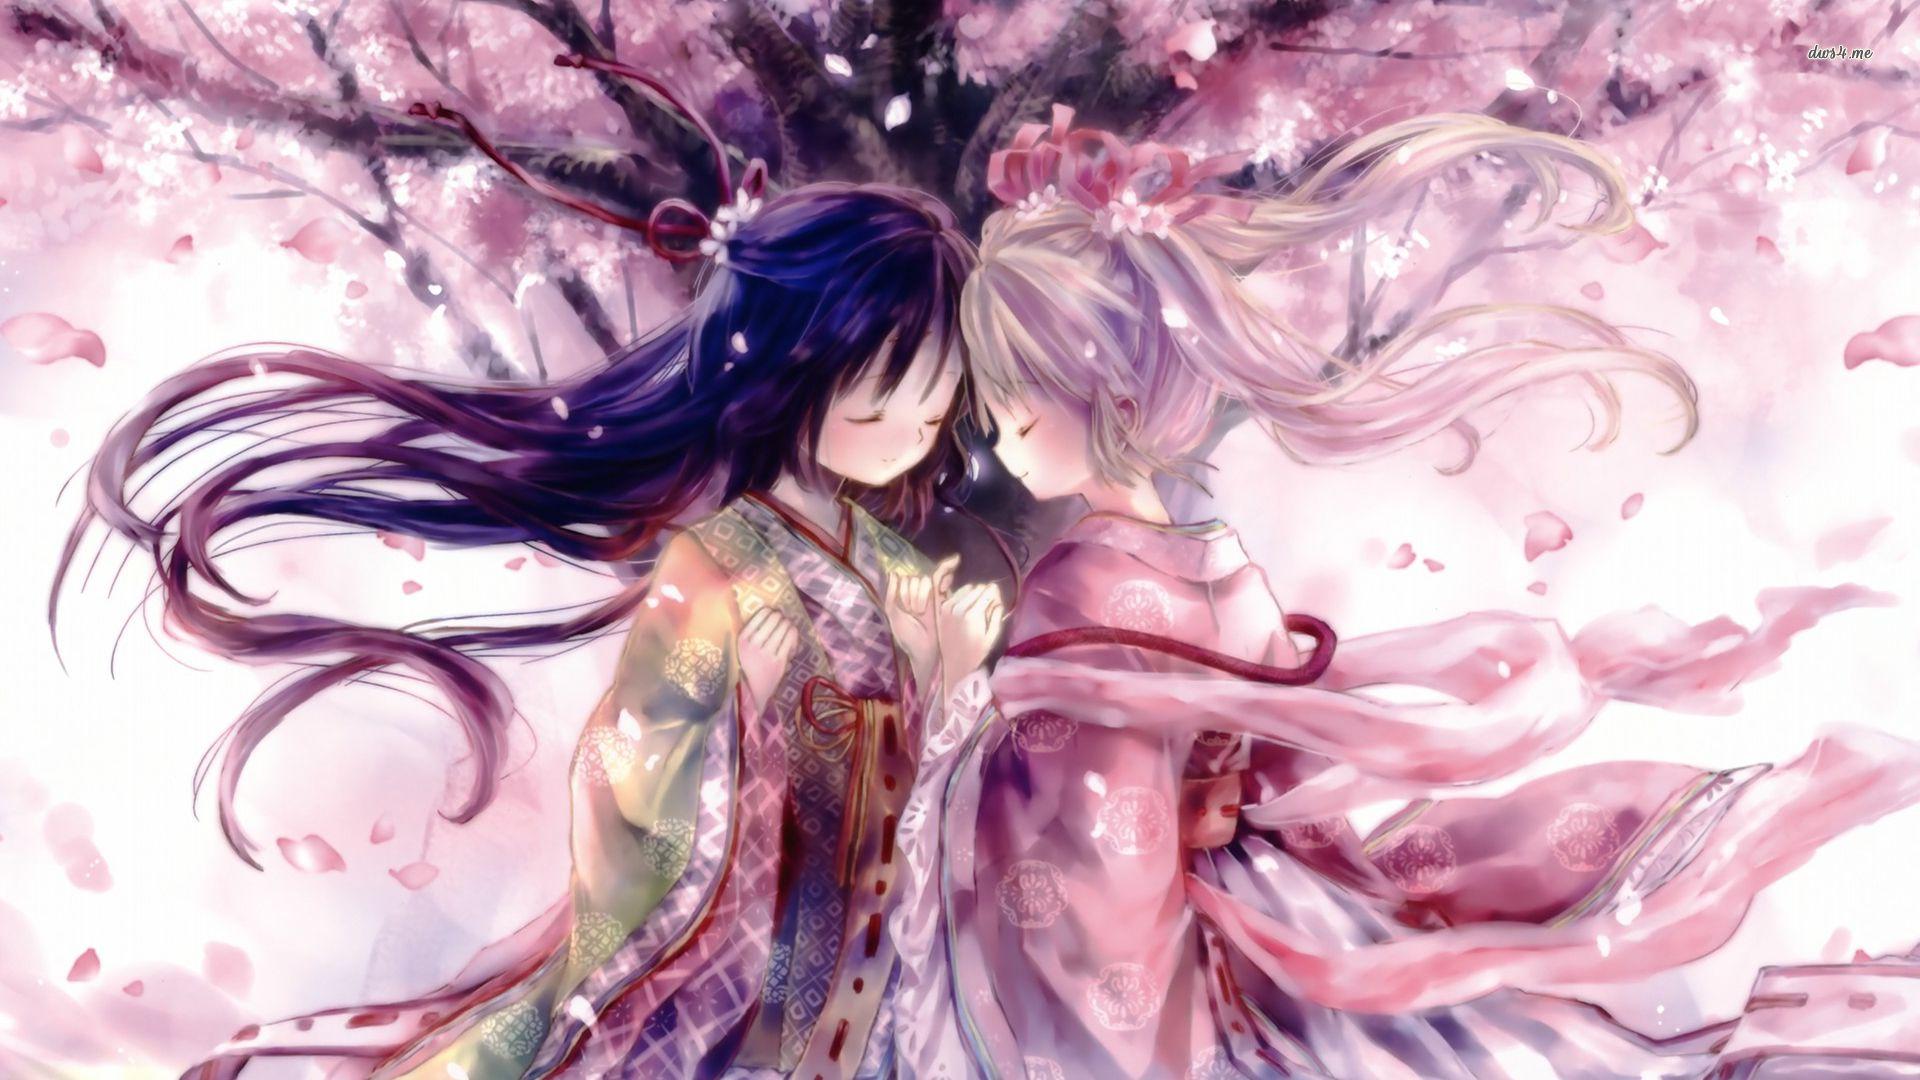 Best friends wallpaper Anime wallpapers 41065 Anime